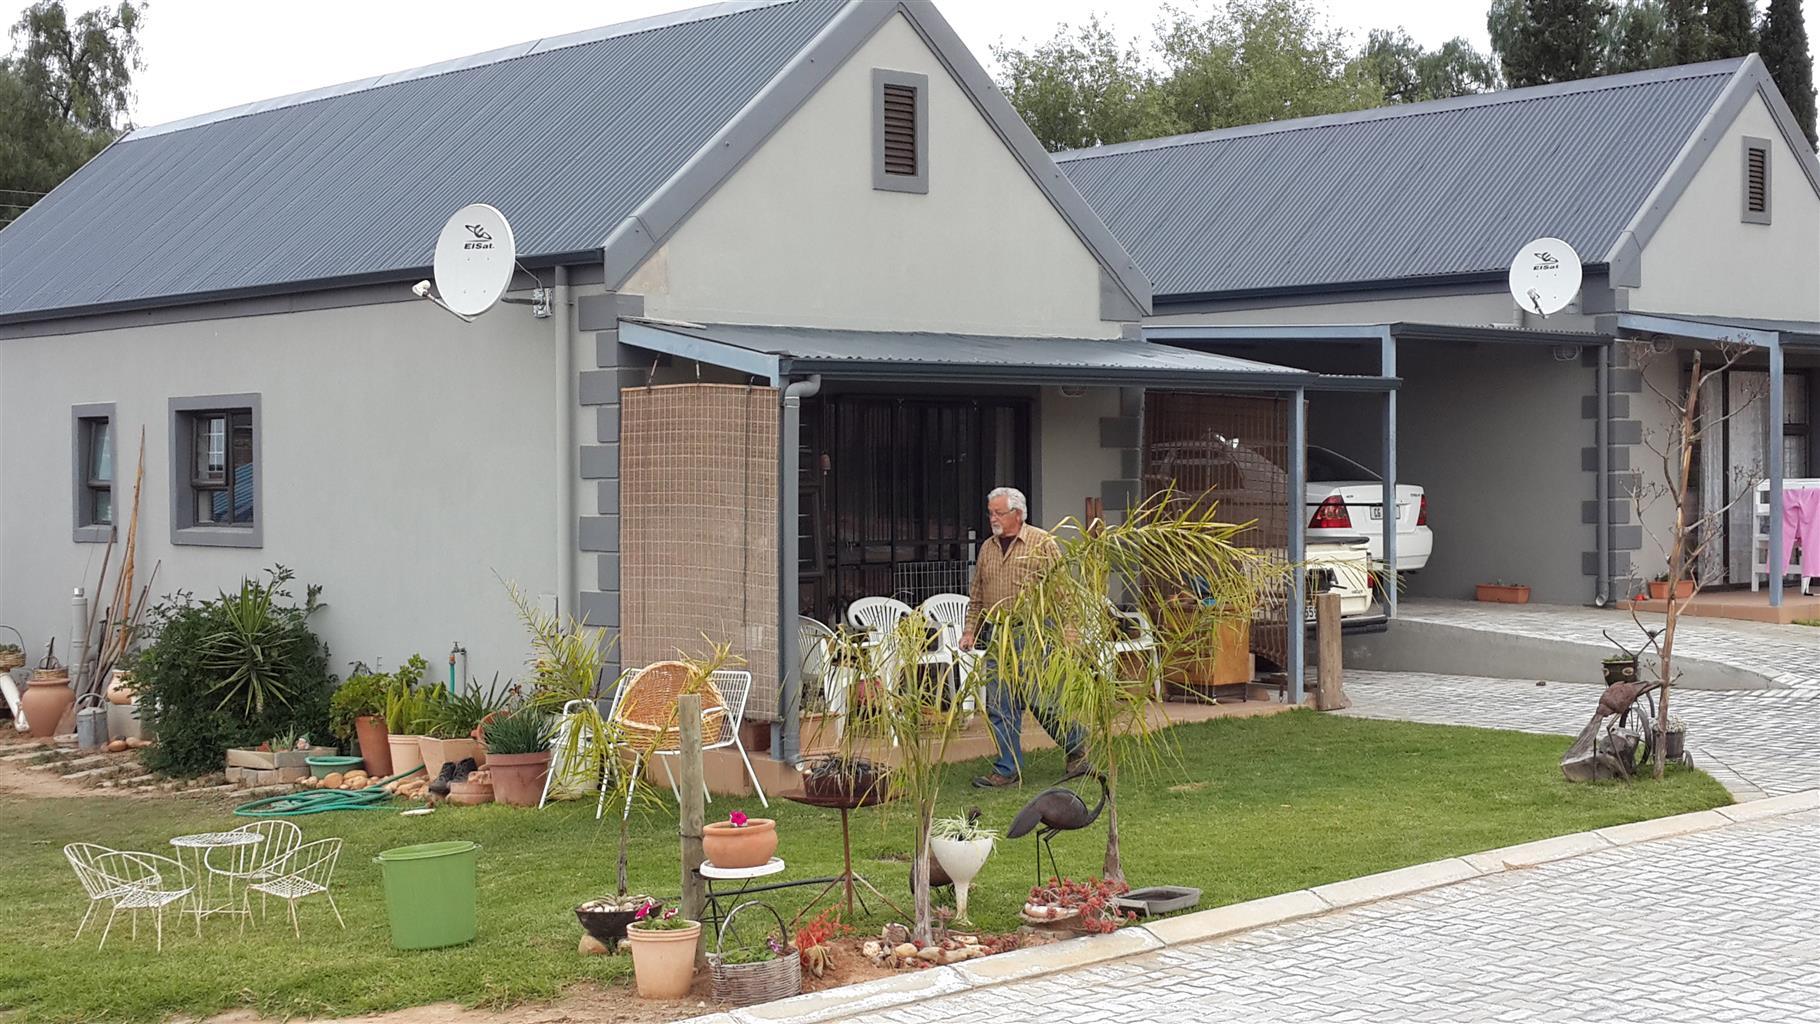 Lovely 2-bedroom home in secure Retirement Village